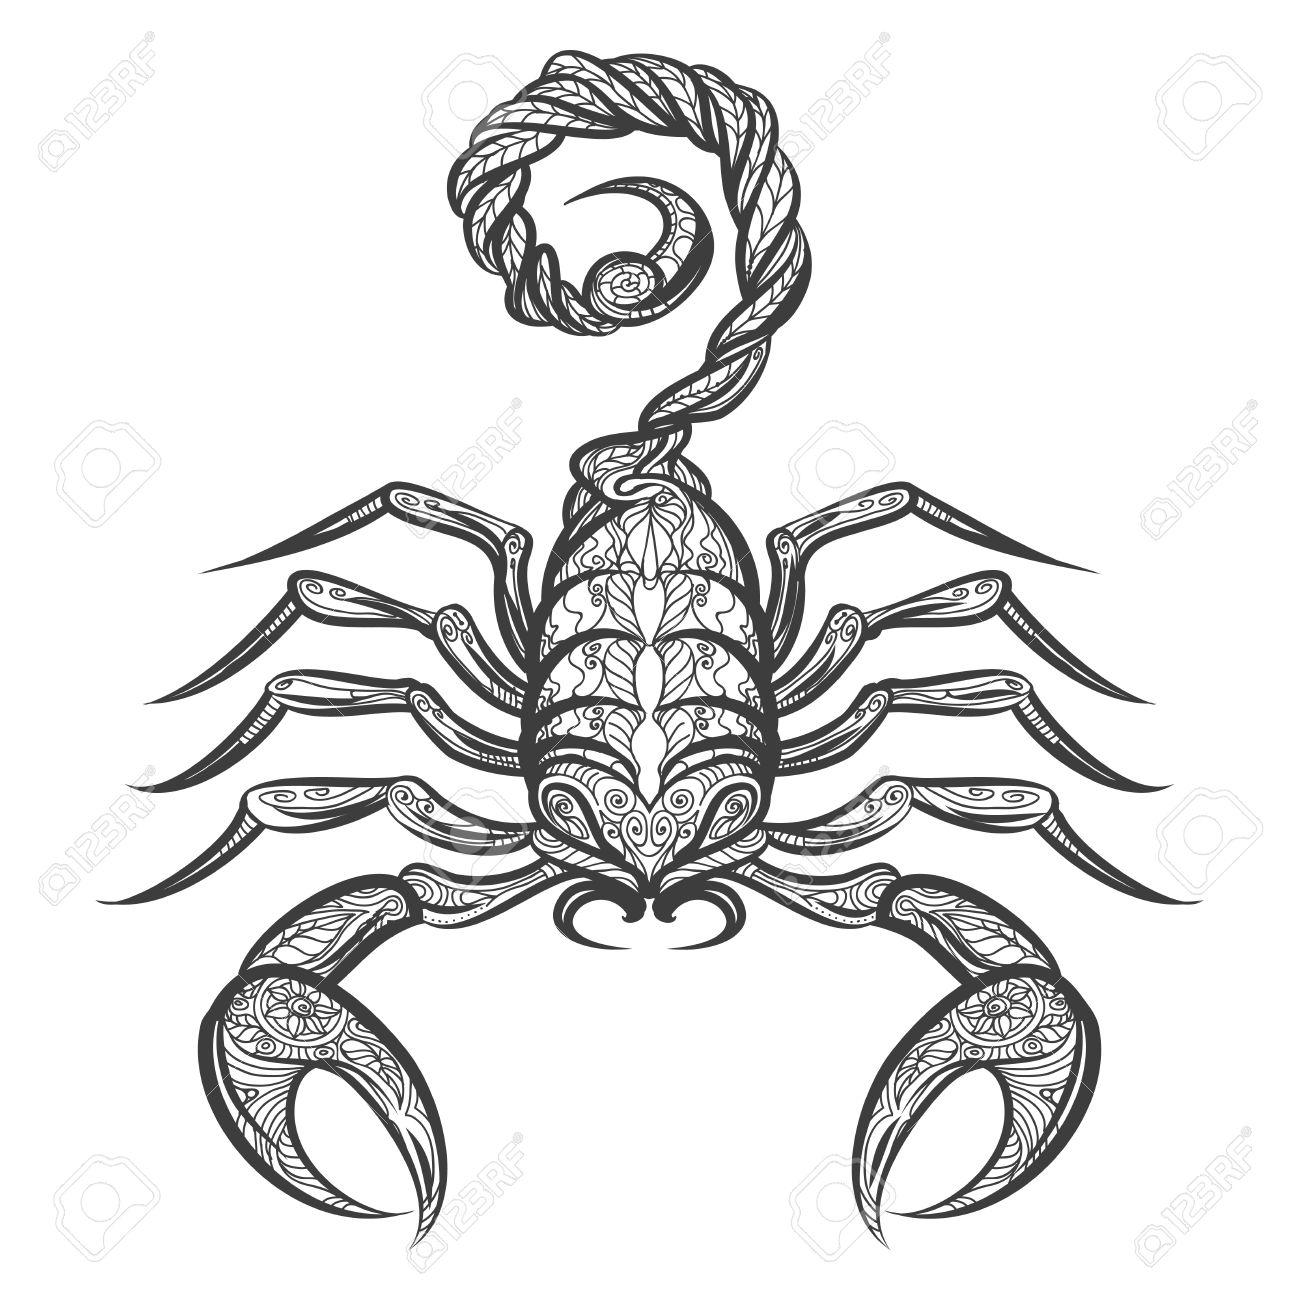 1299x1300 Drawn Scorpion